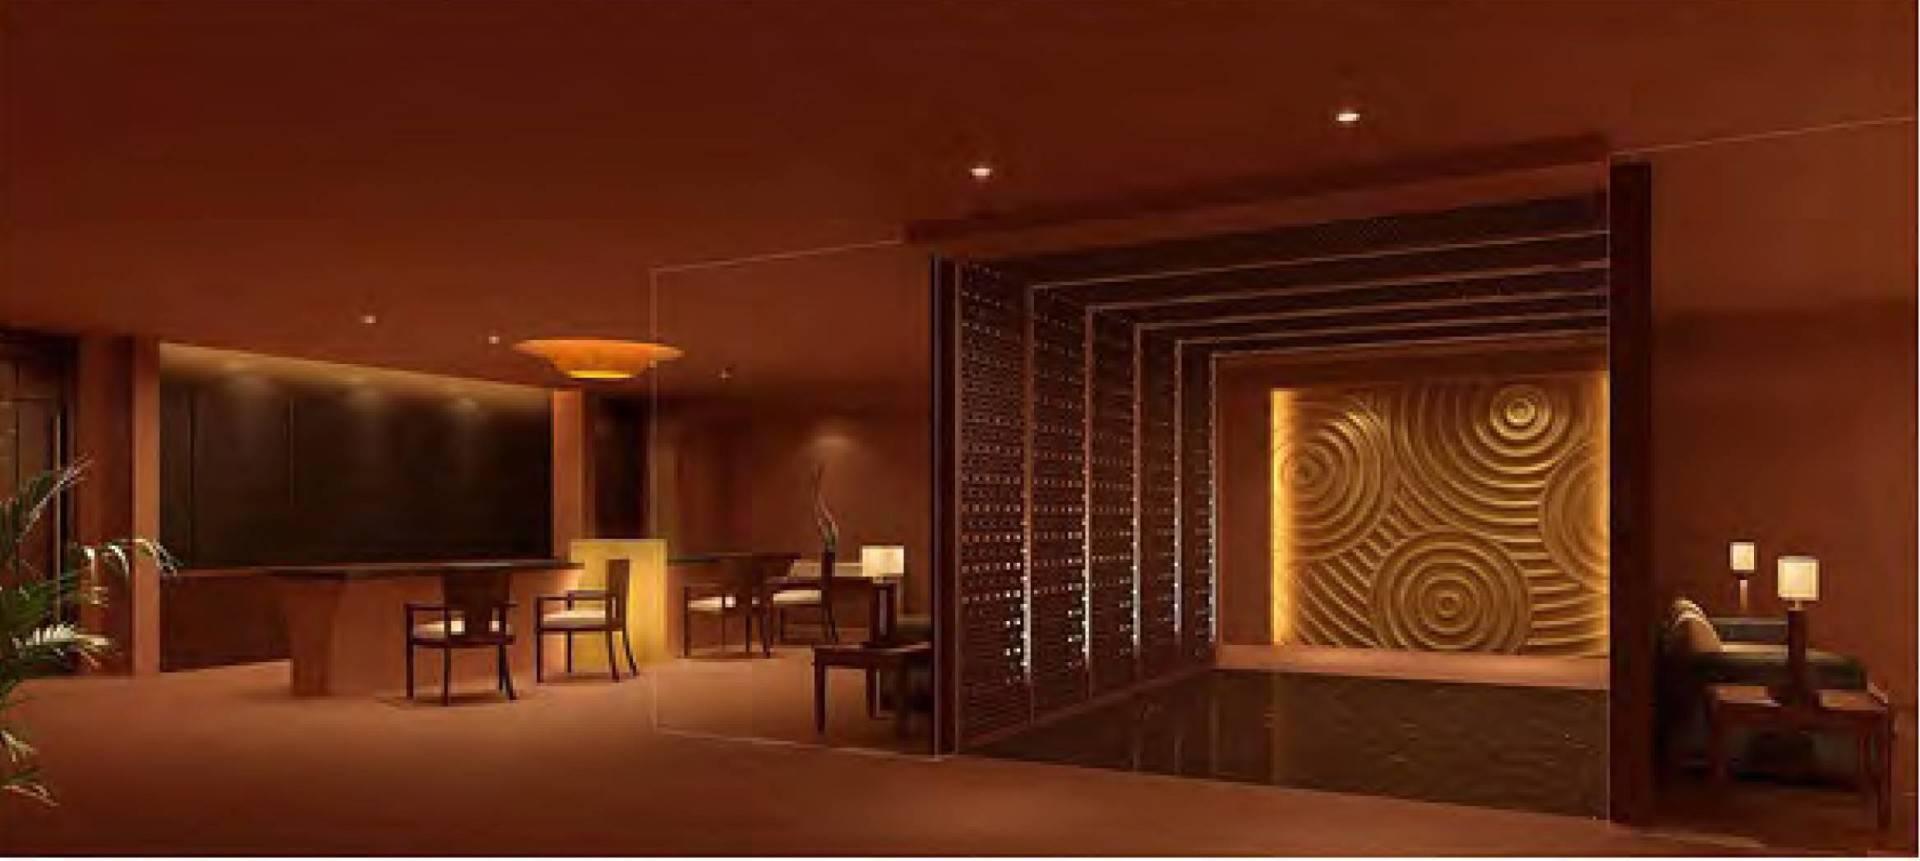 Mul I.d Design Consultant Shangri-La Hotel Qi Spa Chengdu, China Chengdu, China Lounge Kontemporer  3903